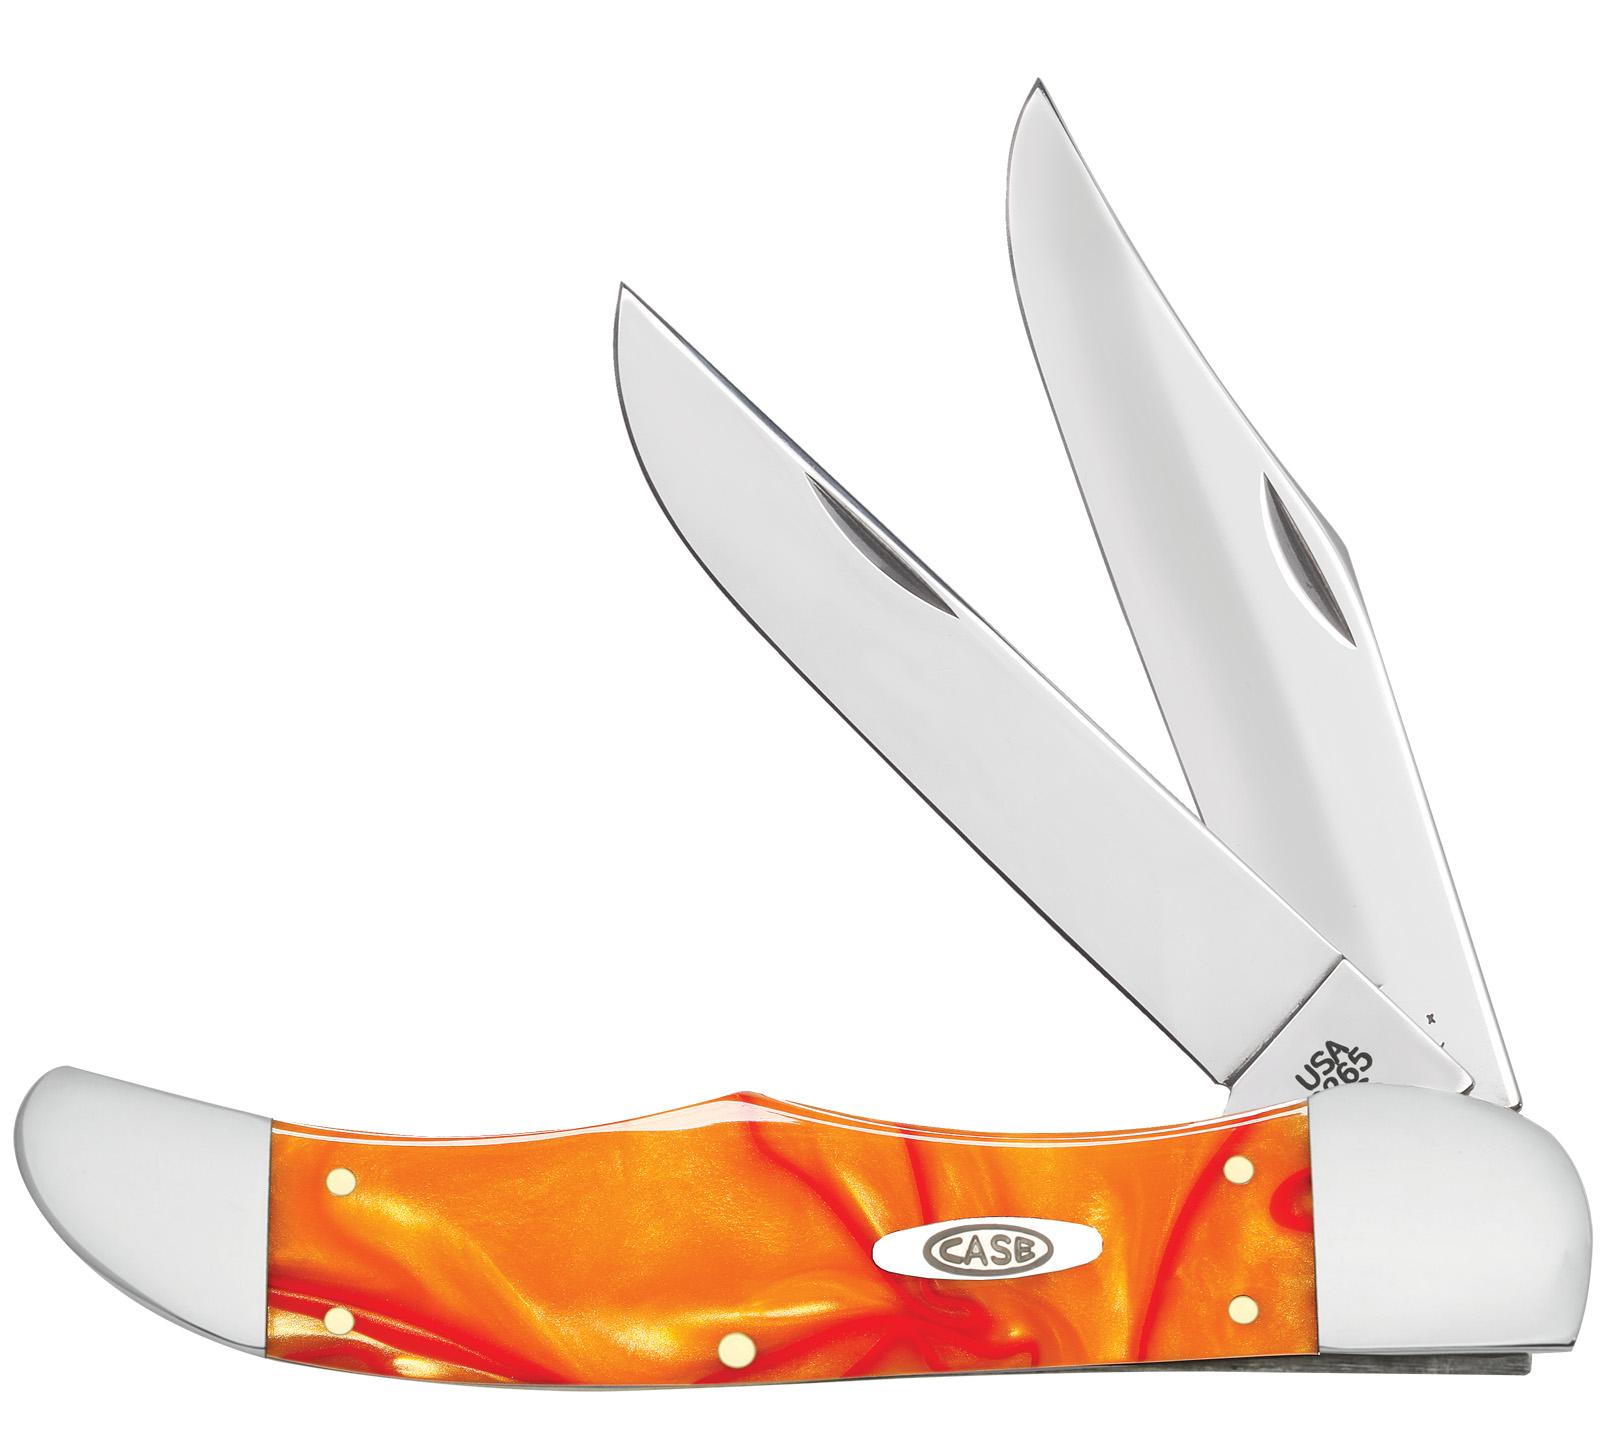 CASE XX KNIFE 25904 KIRINITE ORANGE PEARL FOLDING HUNTER